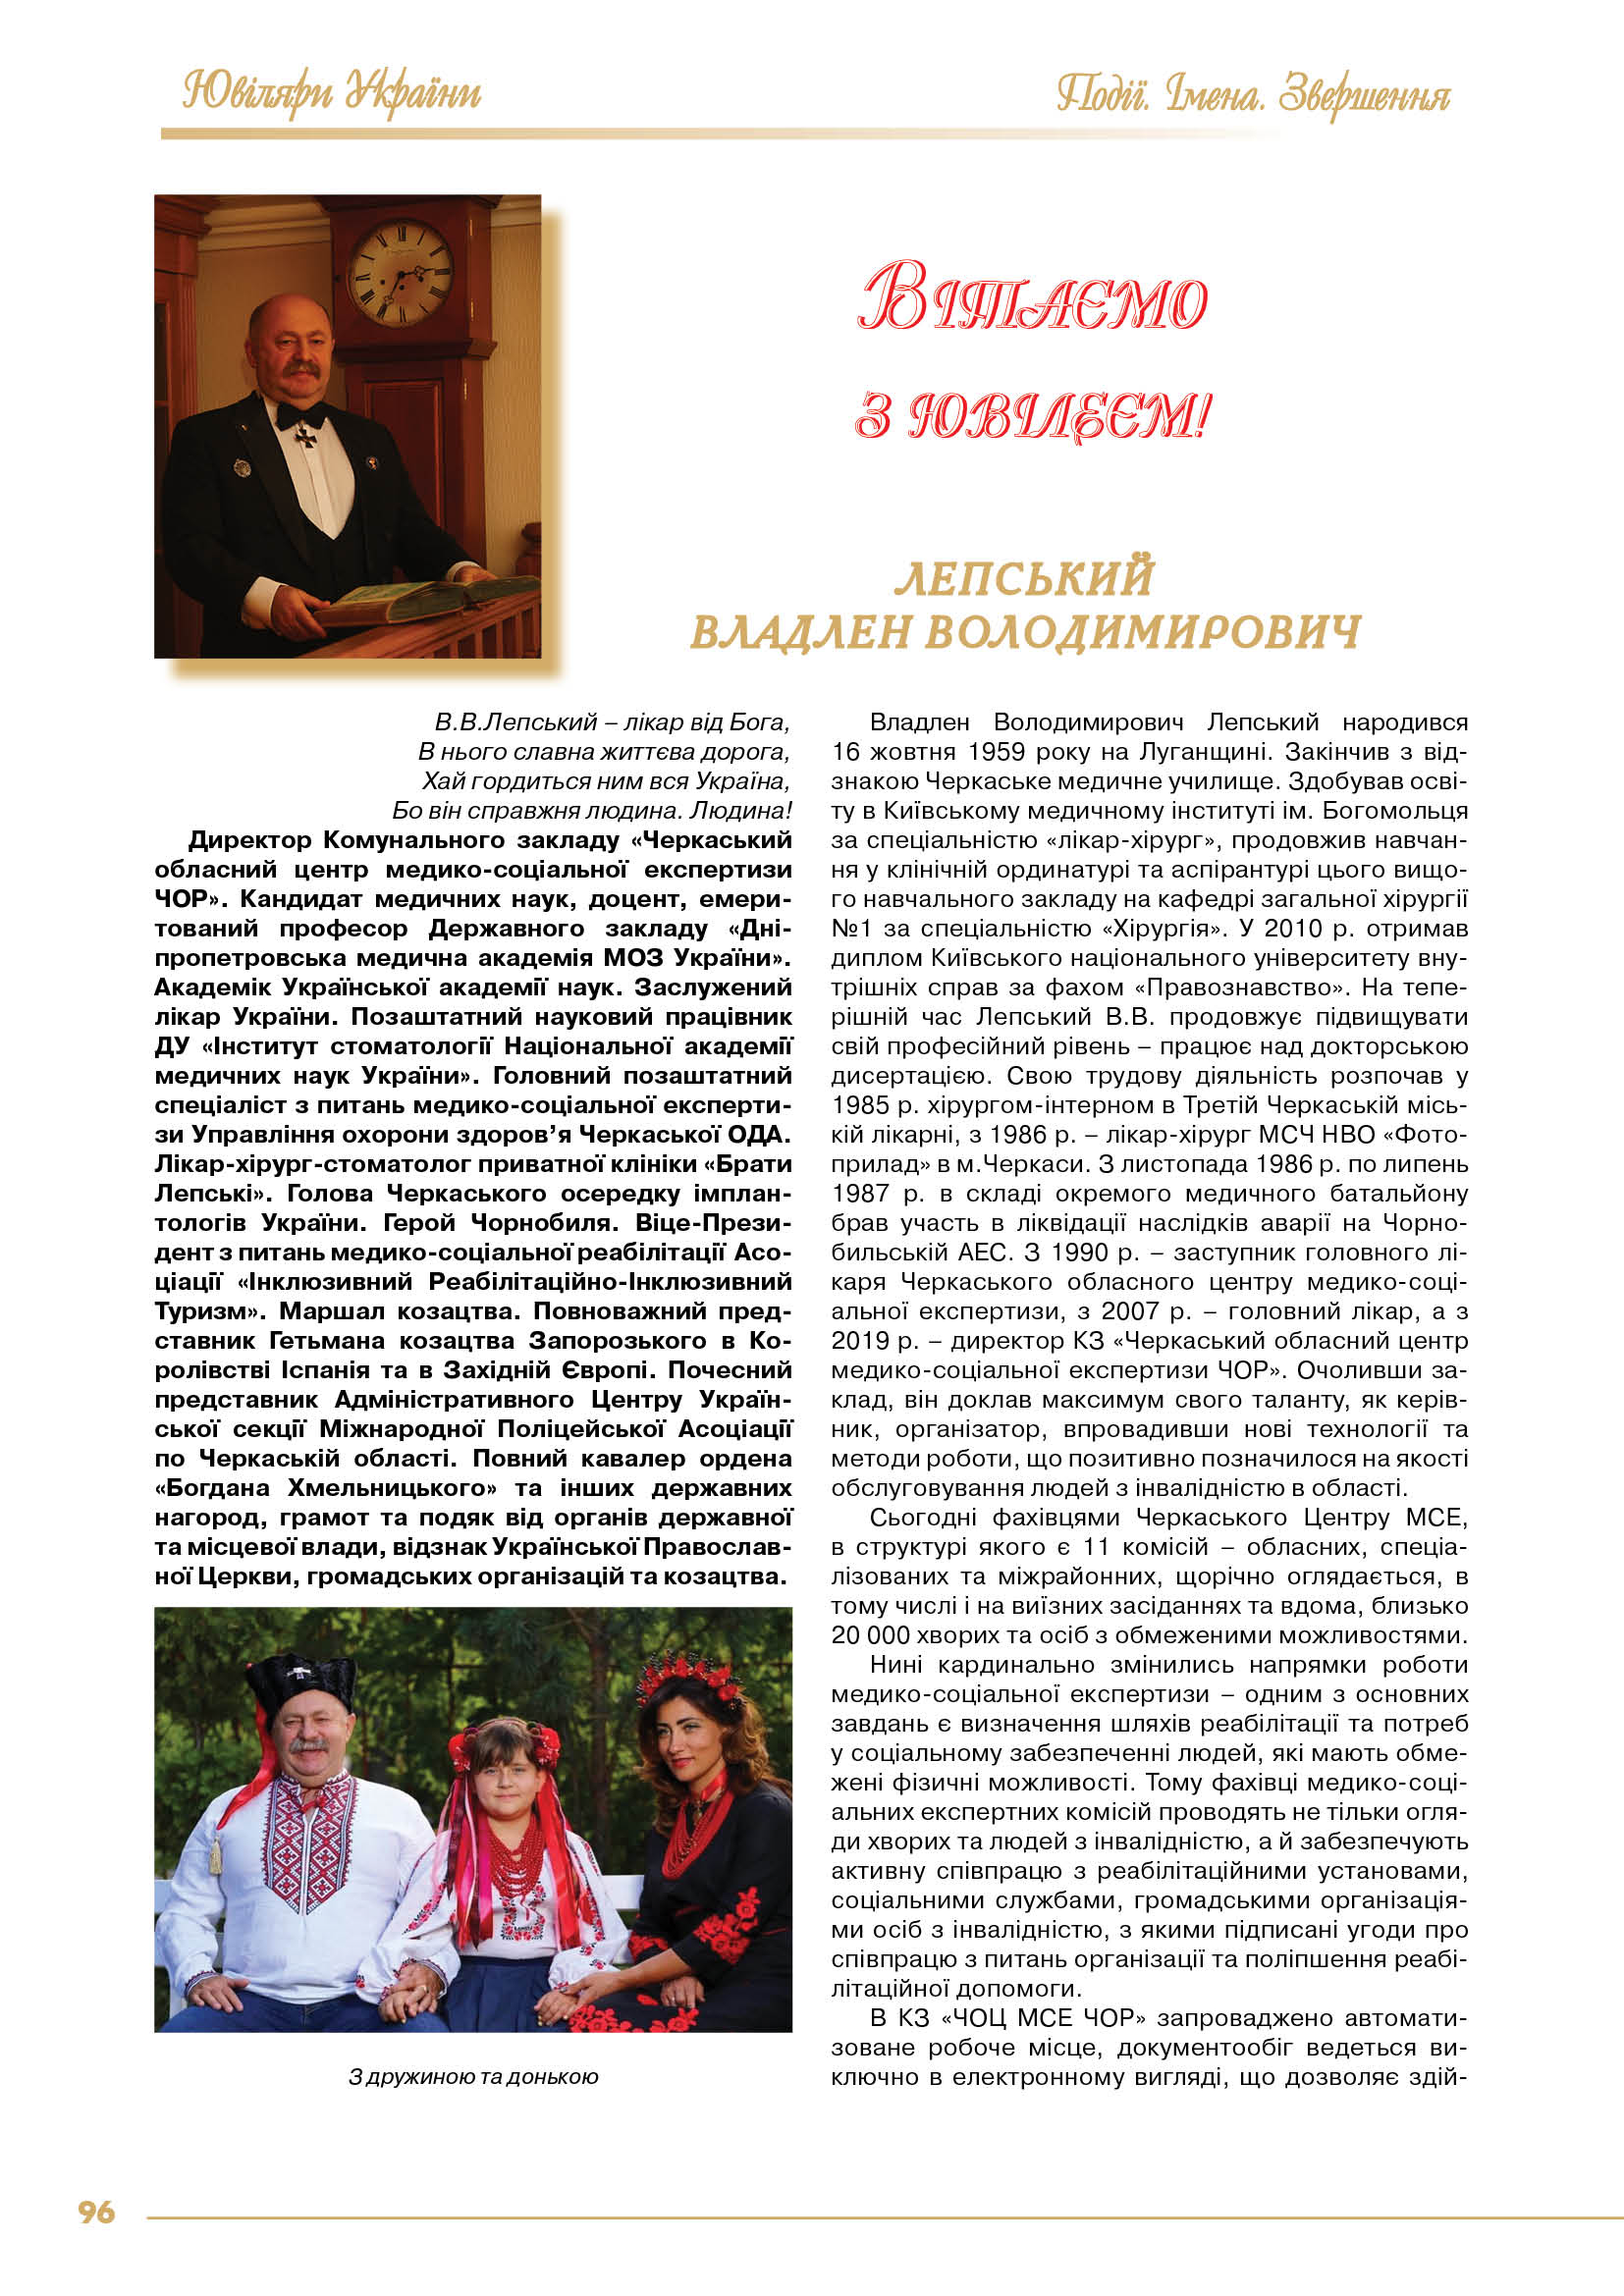 Лепський Владлен Володимирович